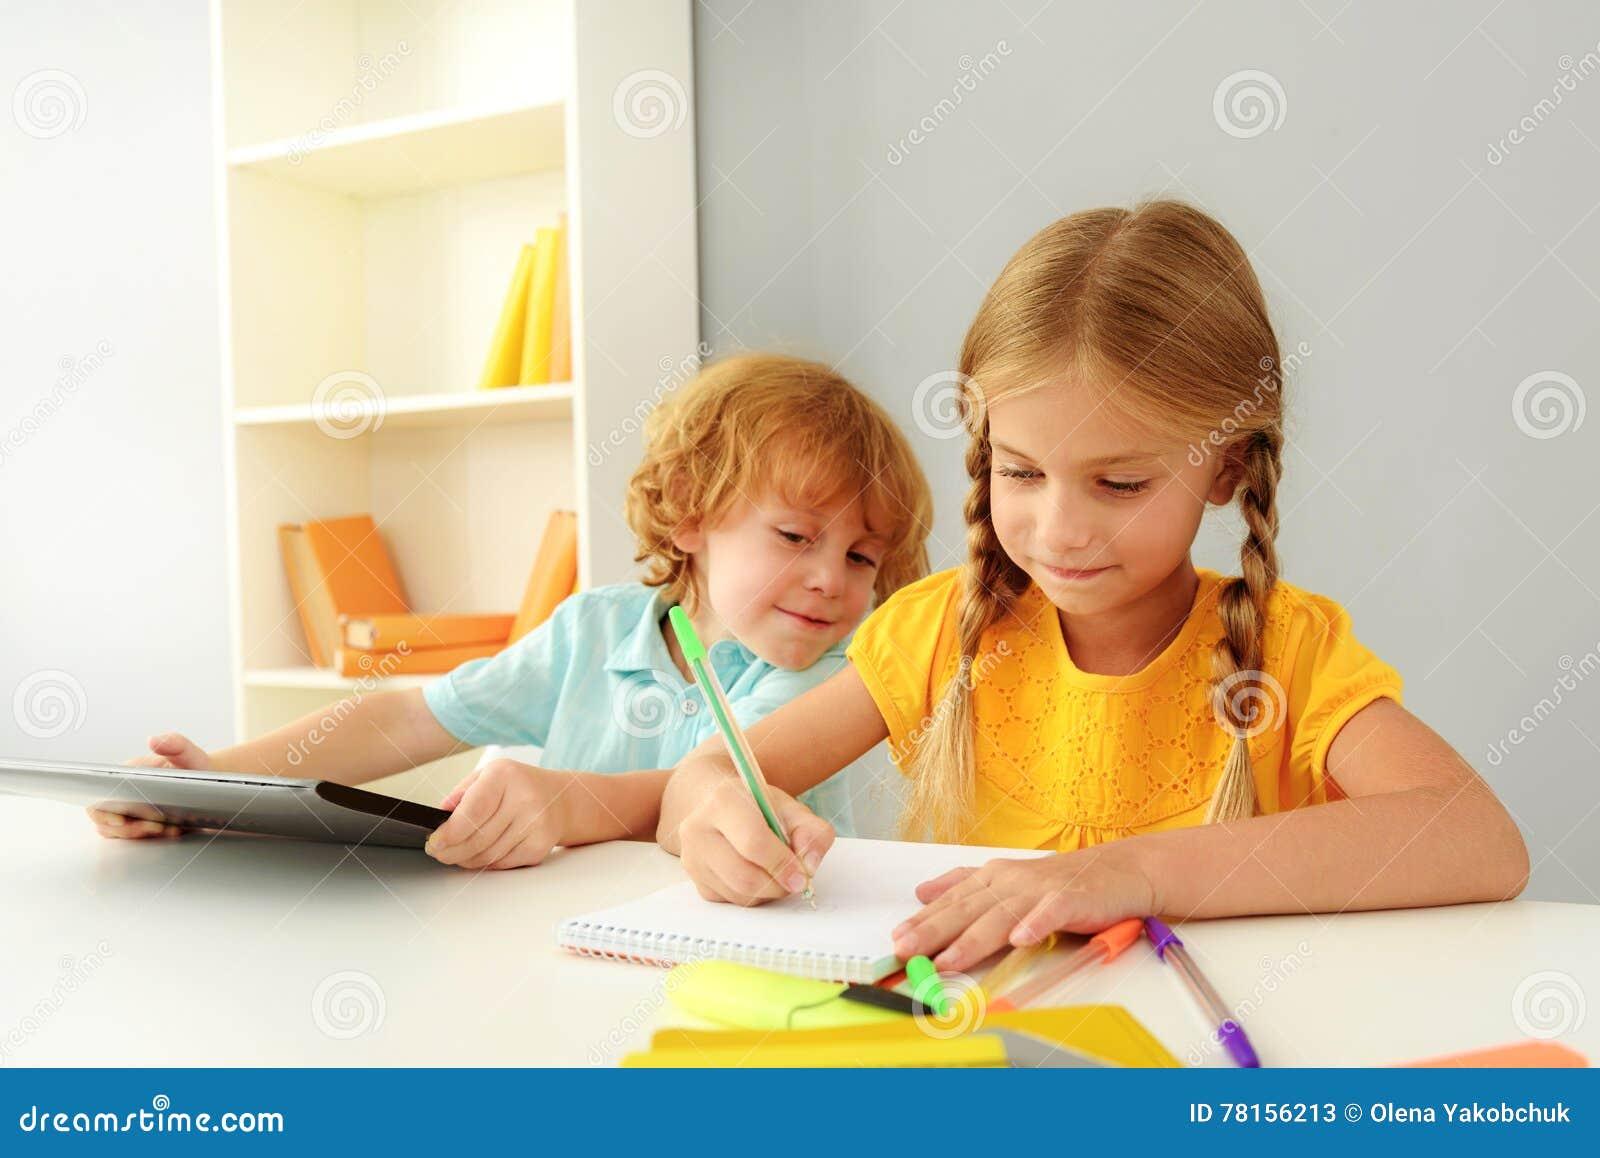 happy kids studying in kindergarten stock image image of childhood